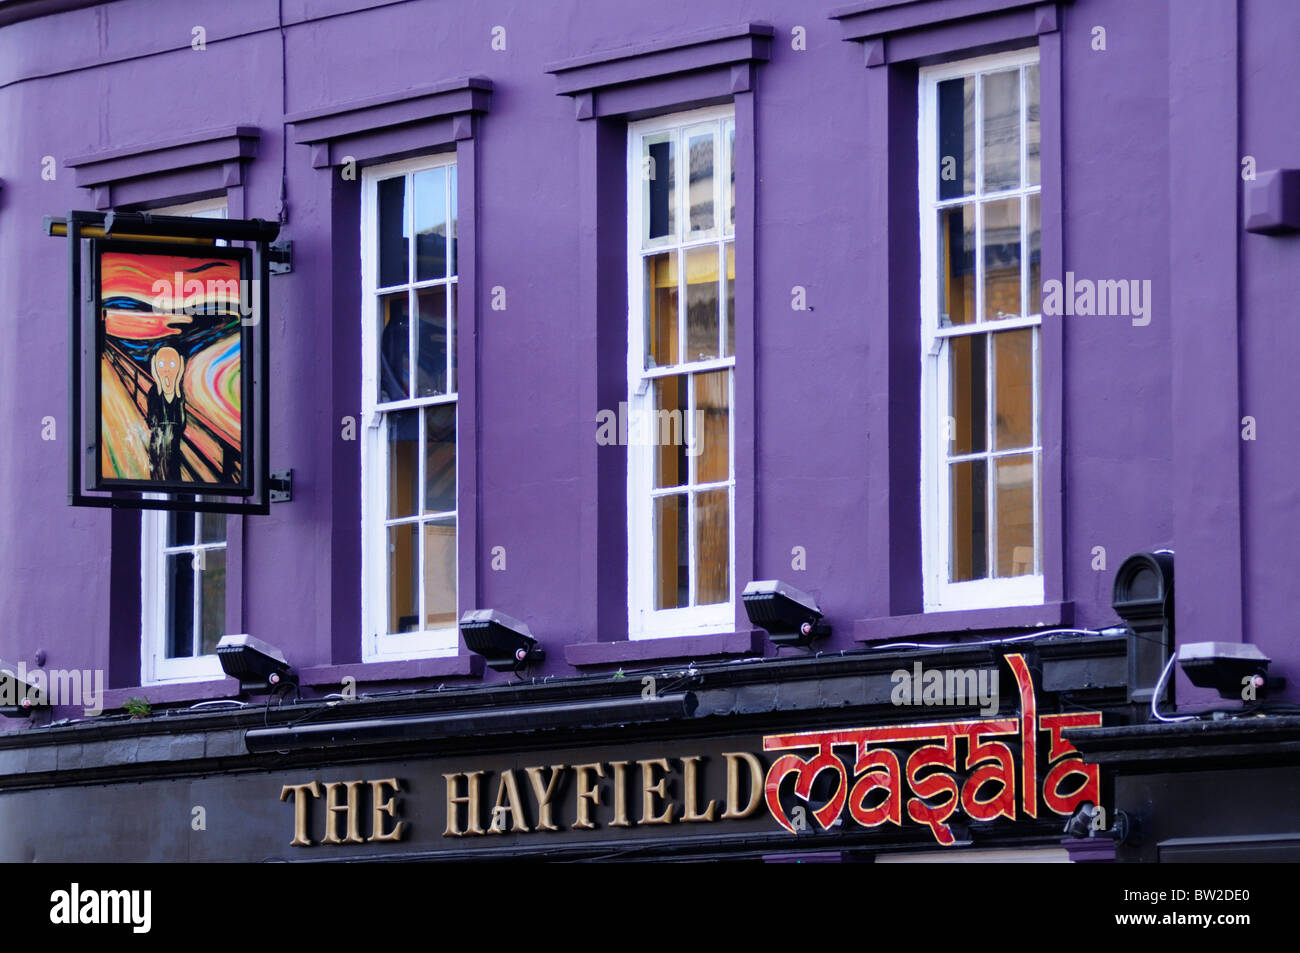 The Hayfield Masala restaurant, Mile End Road, London, England, UK - Stock Image